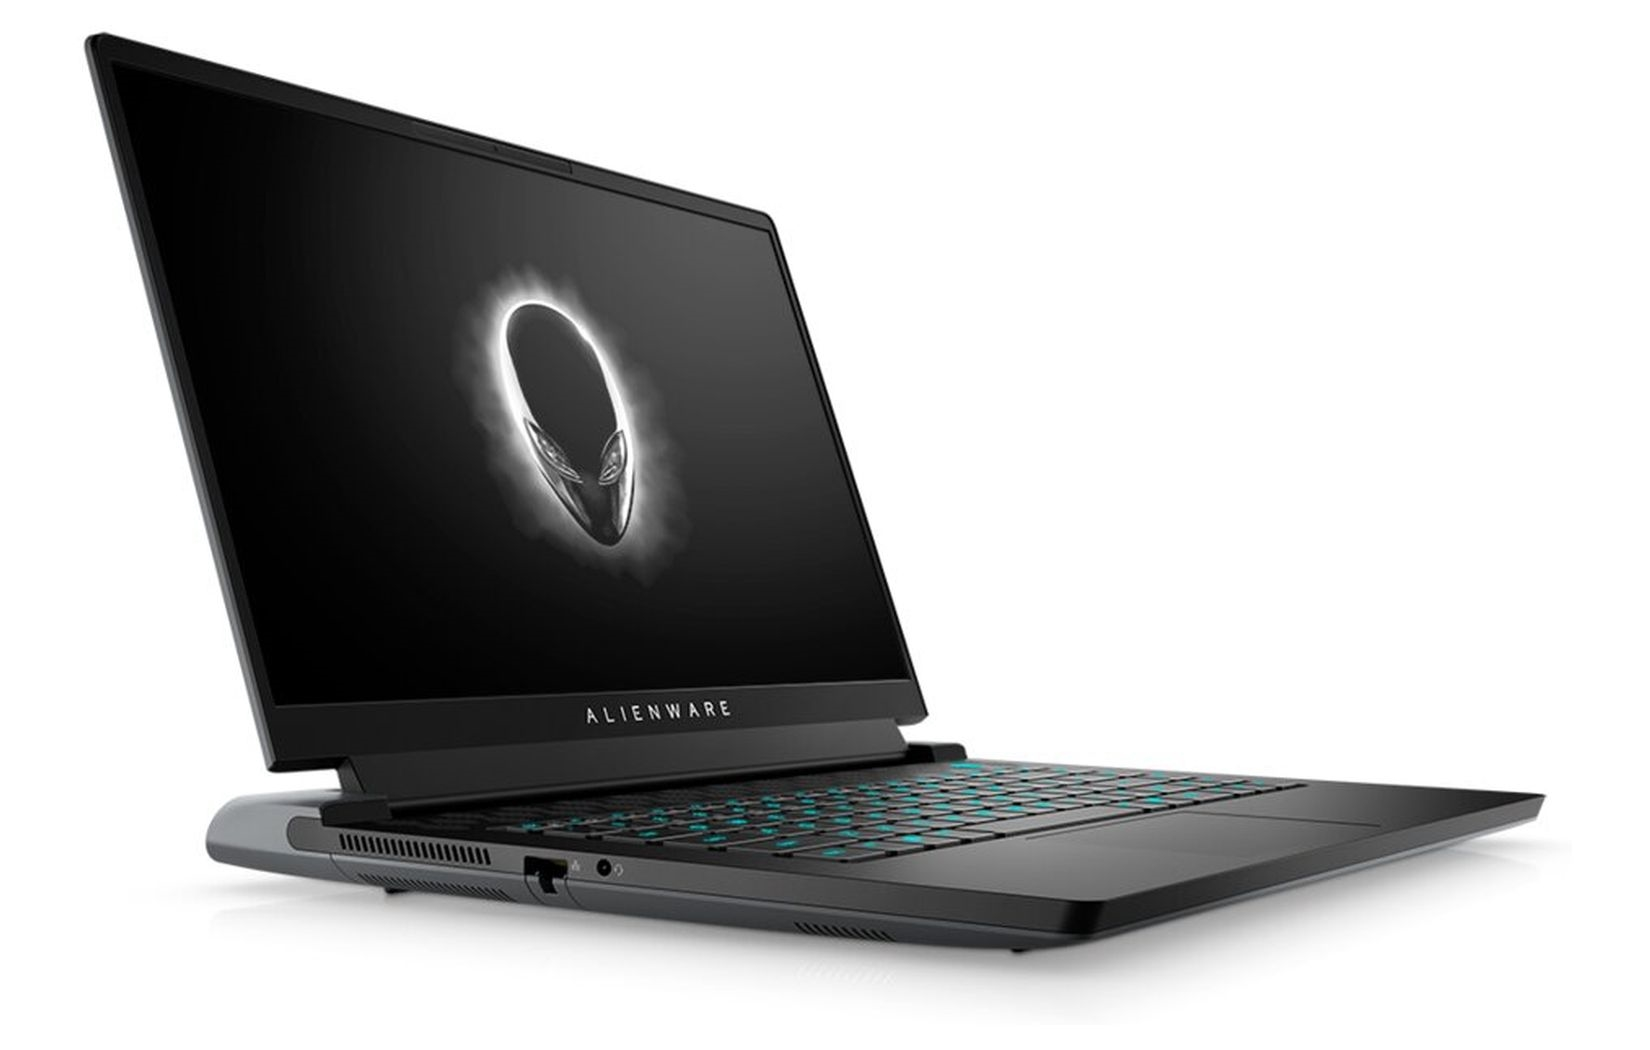 Alienware m15 R5锐龙游戏本发布:15年来首次拥抱AMD